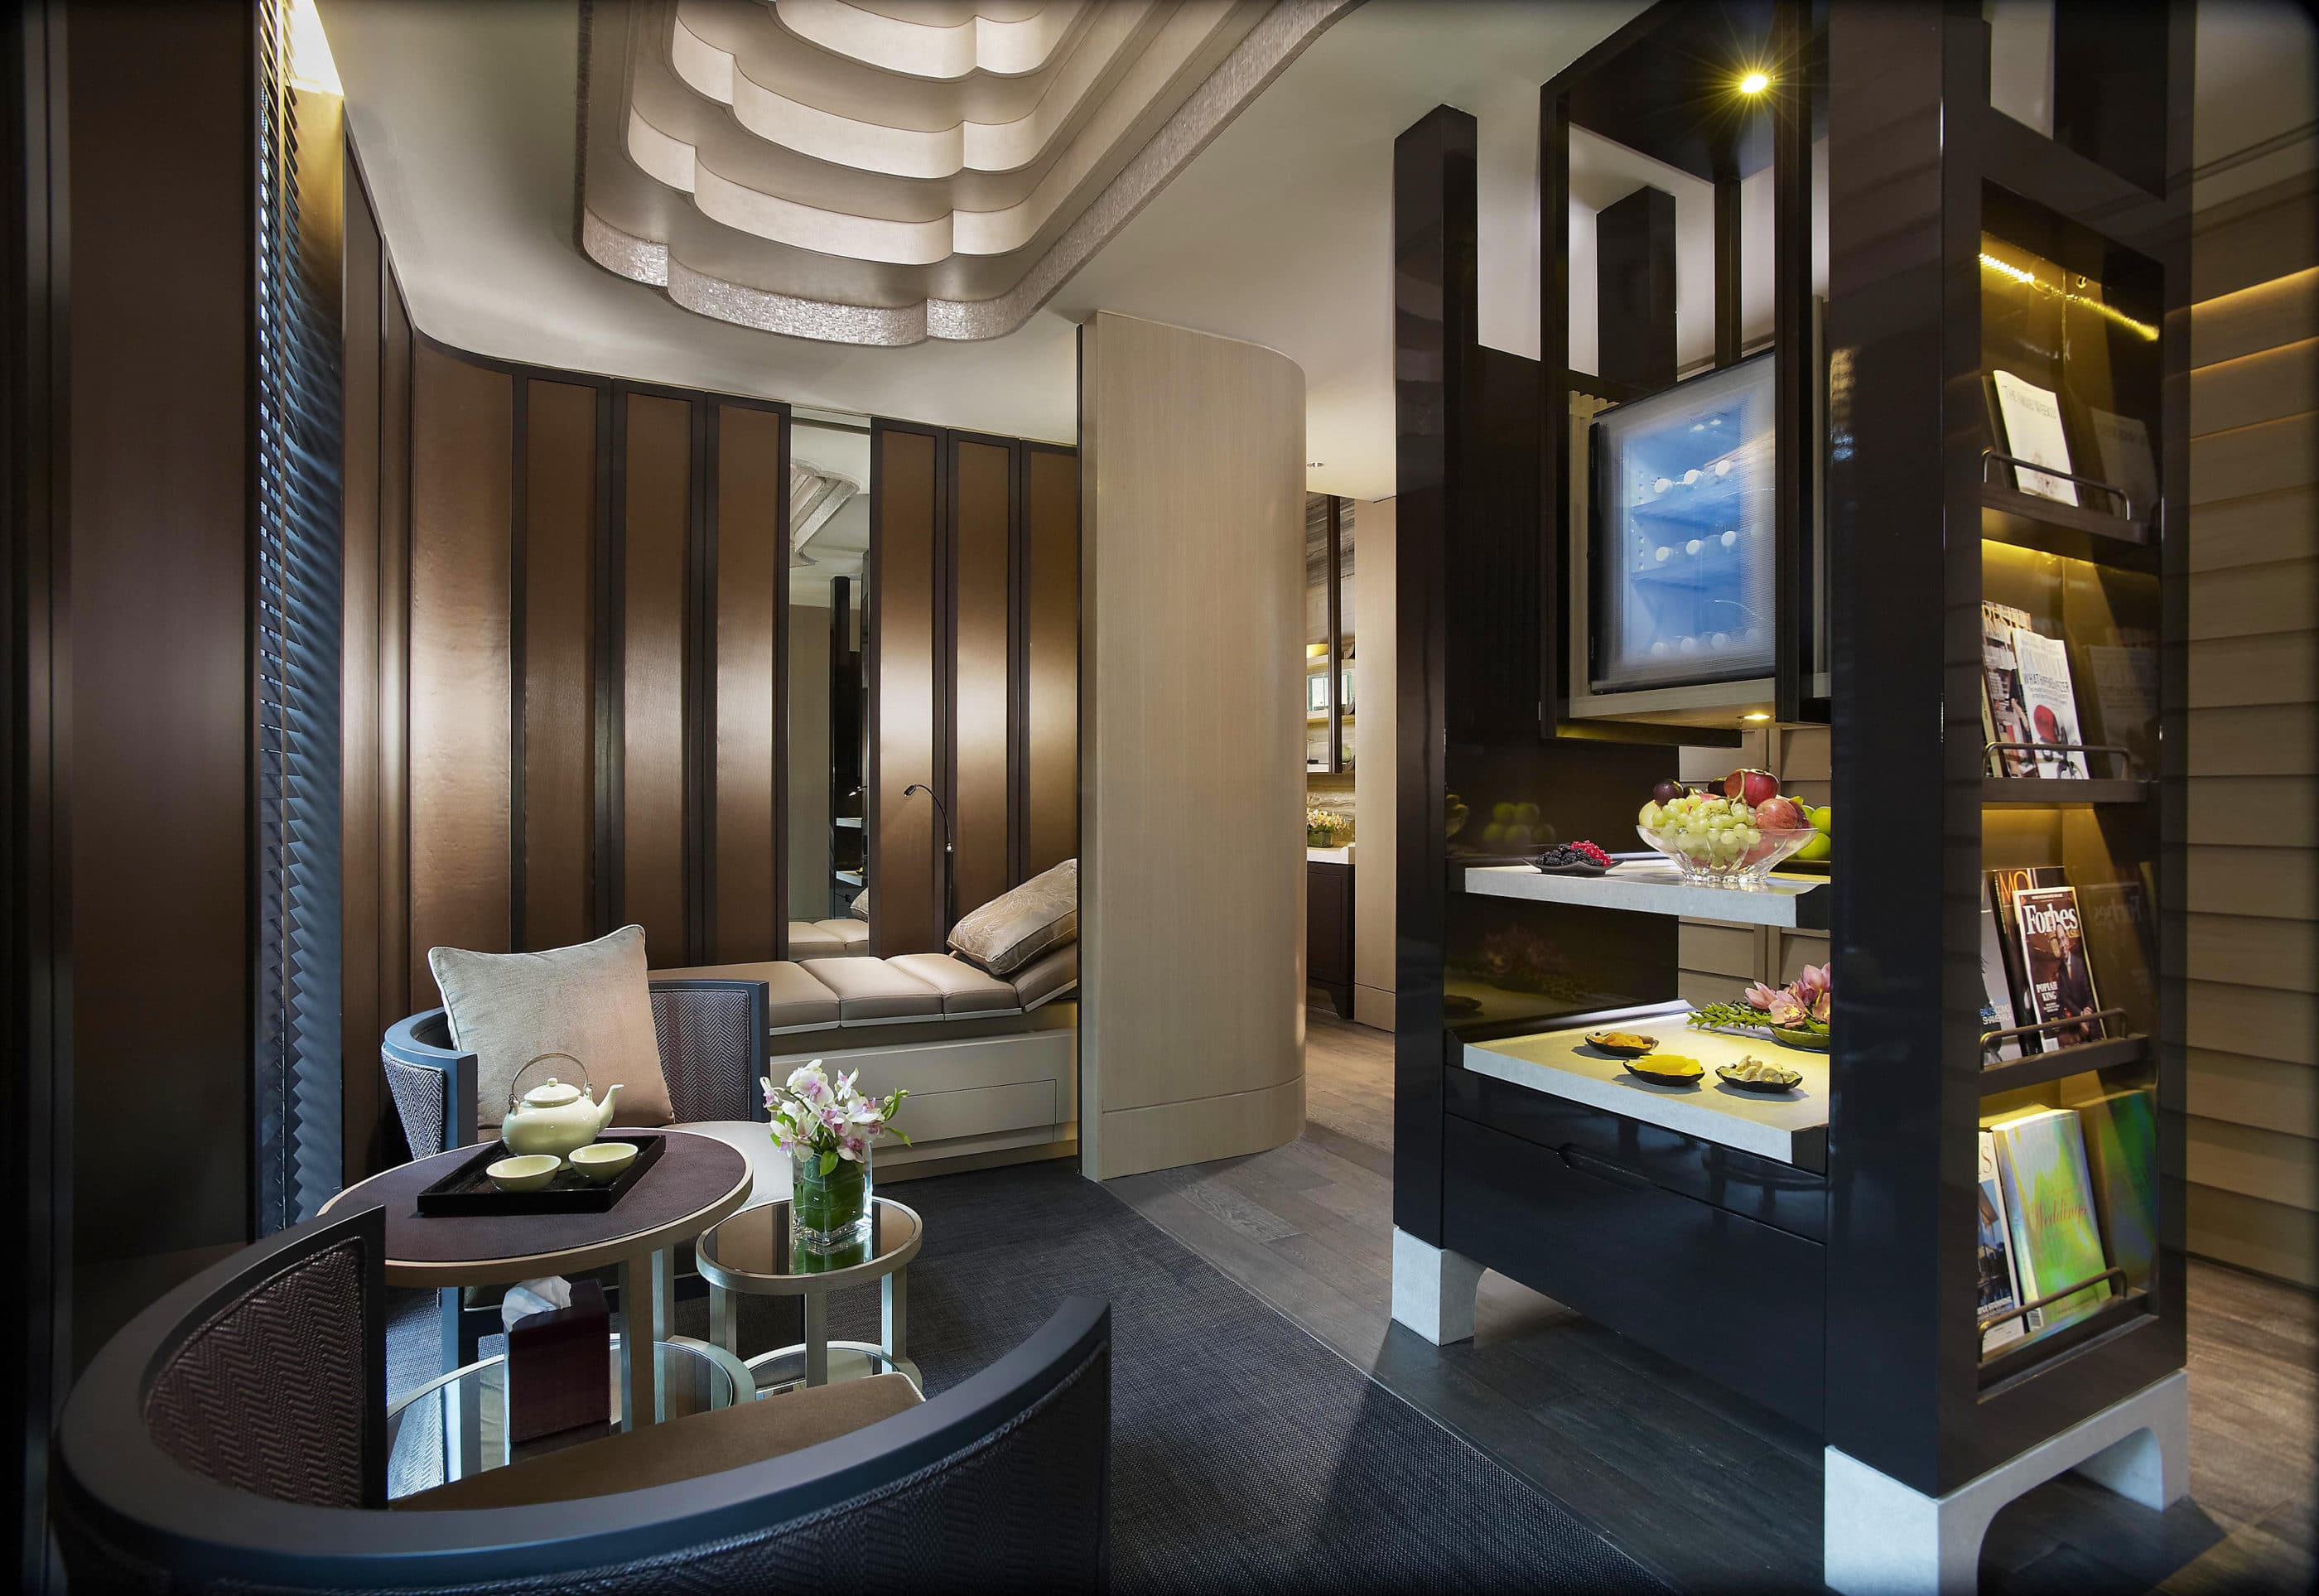 The Spa at Mandarin Oriental, Singapore Tea Lounge